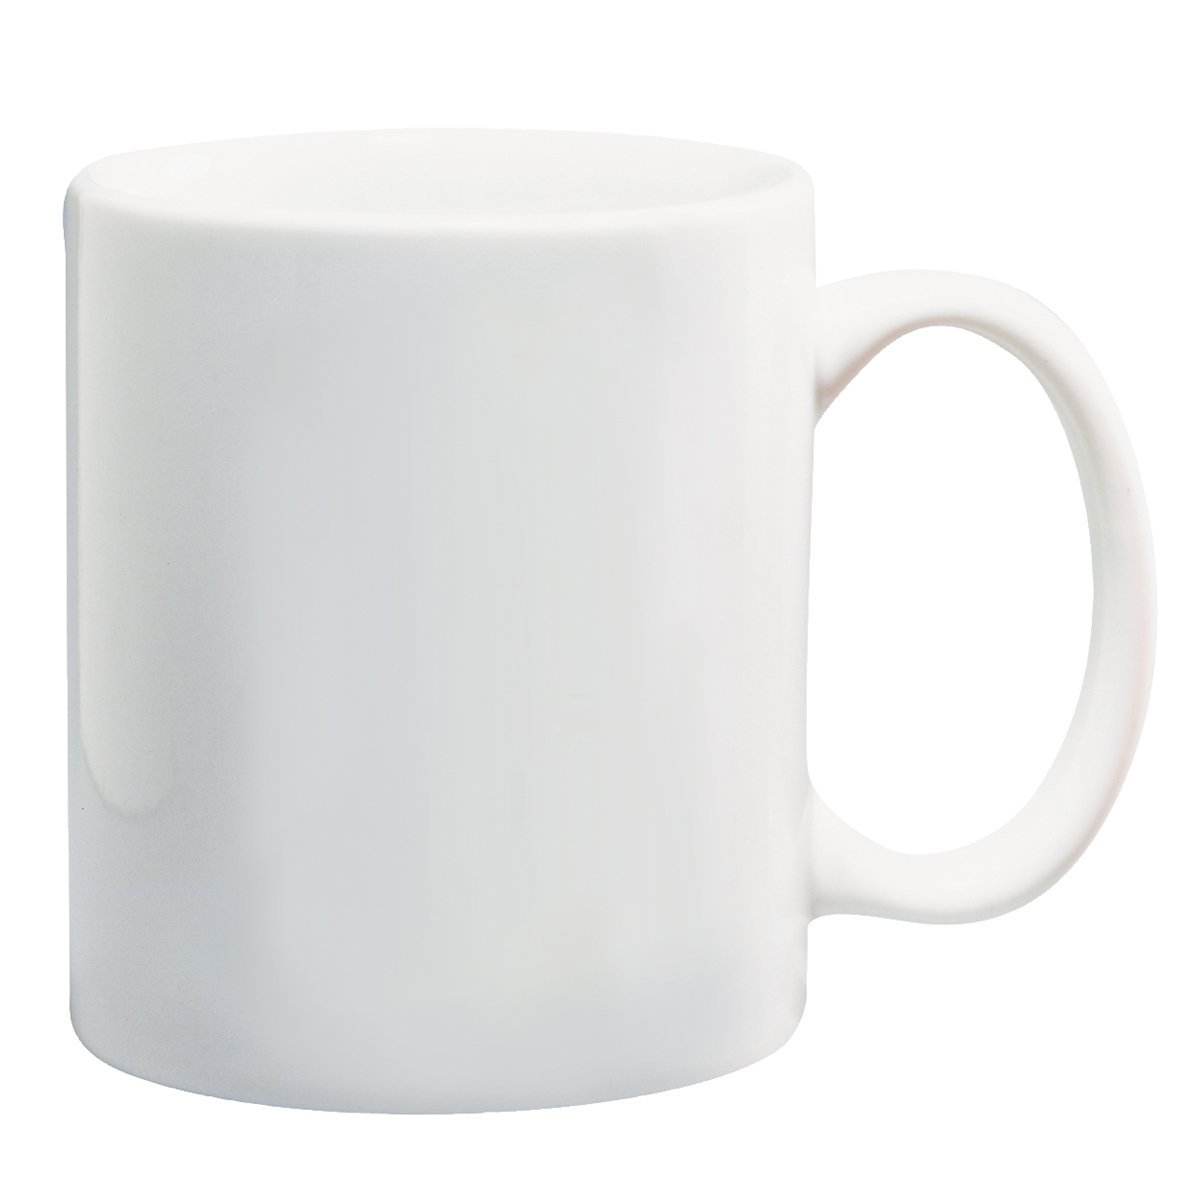 What I Want Mug